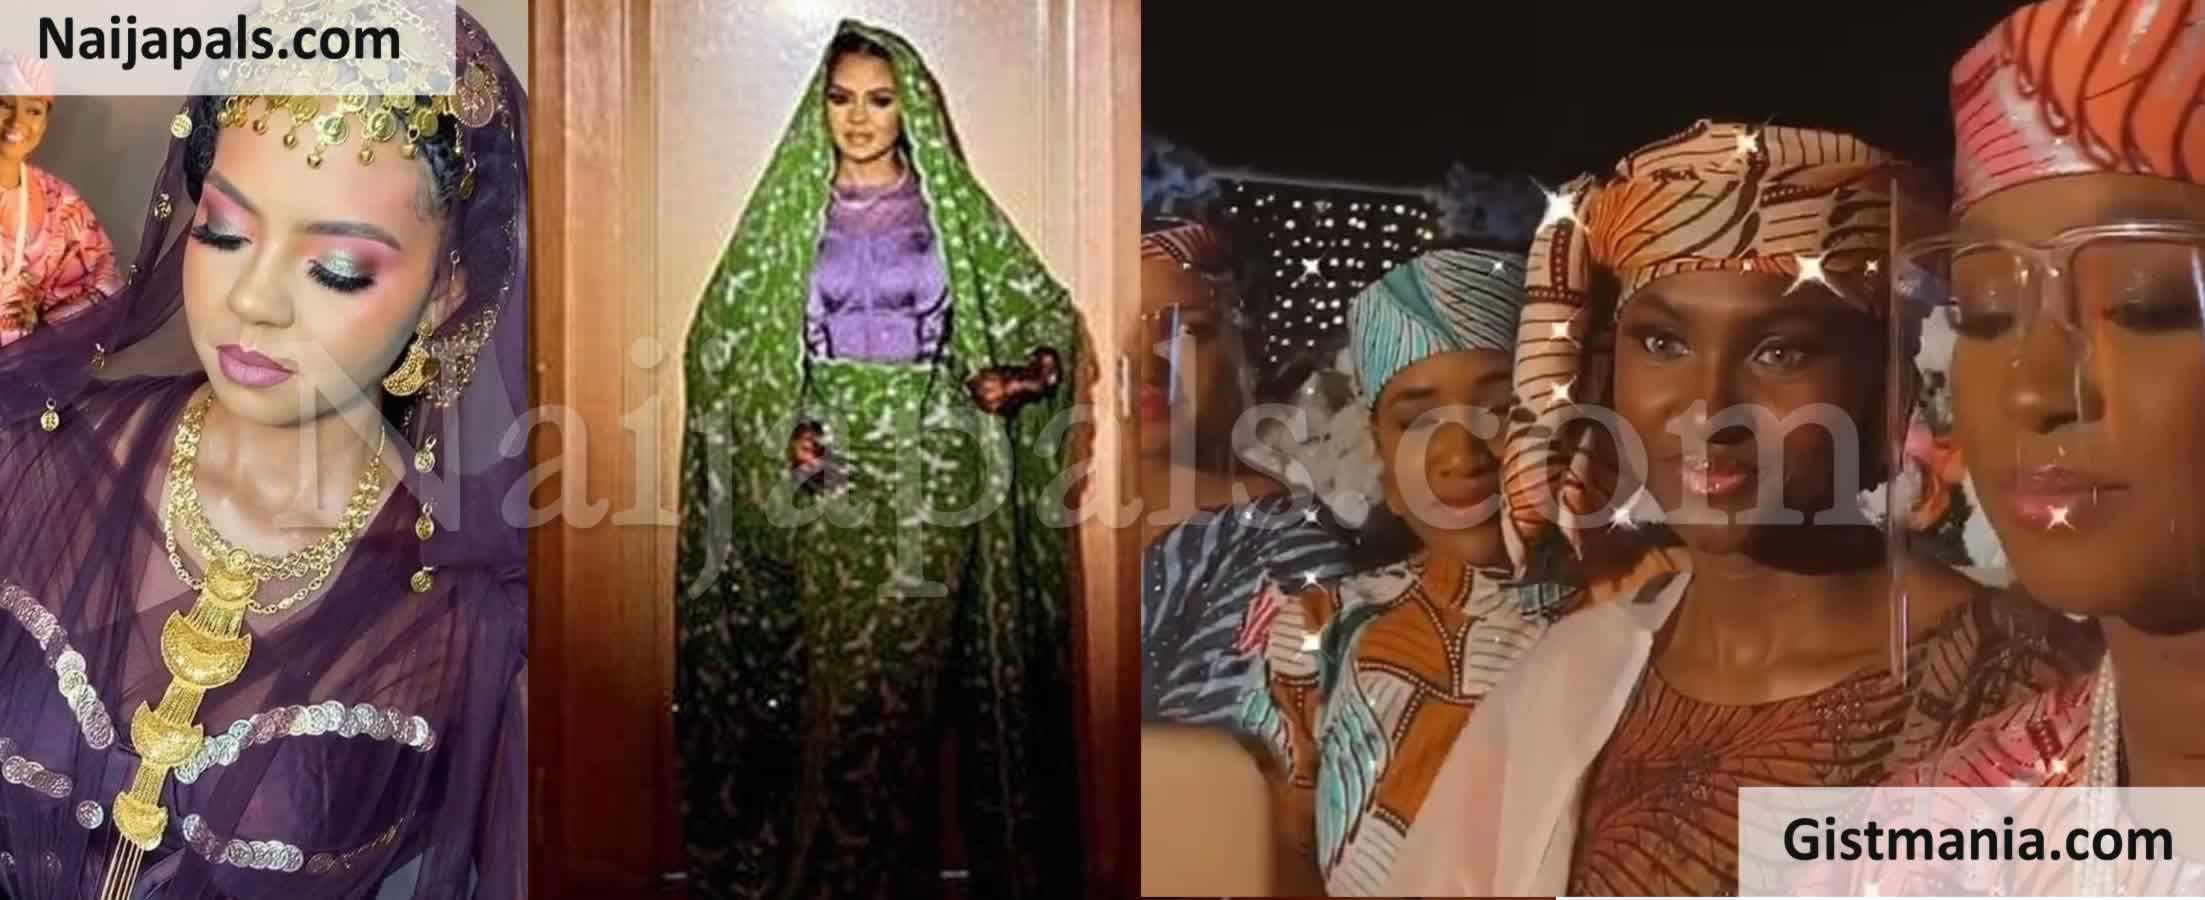 <img alt='.' class='lazyload' data-src='https://img.gistmania.com/emot/love.gif' /><img alt='.' class='lazyload' data-src='https://img.gistmania.com/emot/photo.png' /> <b>Lovely Wedding Photos Of Billionaire Daughter, Adama Indimi To Billionaire Malik Ado-Ibrahim</b>